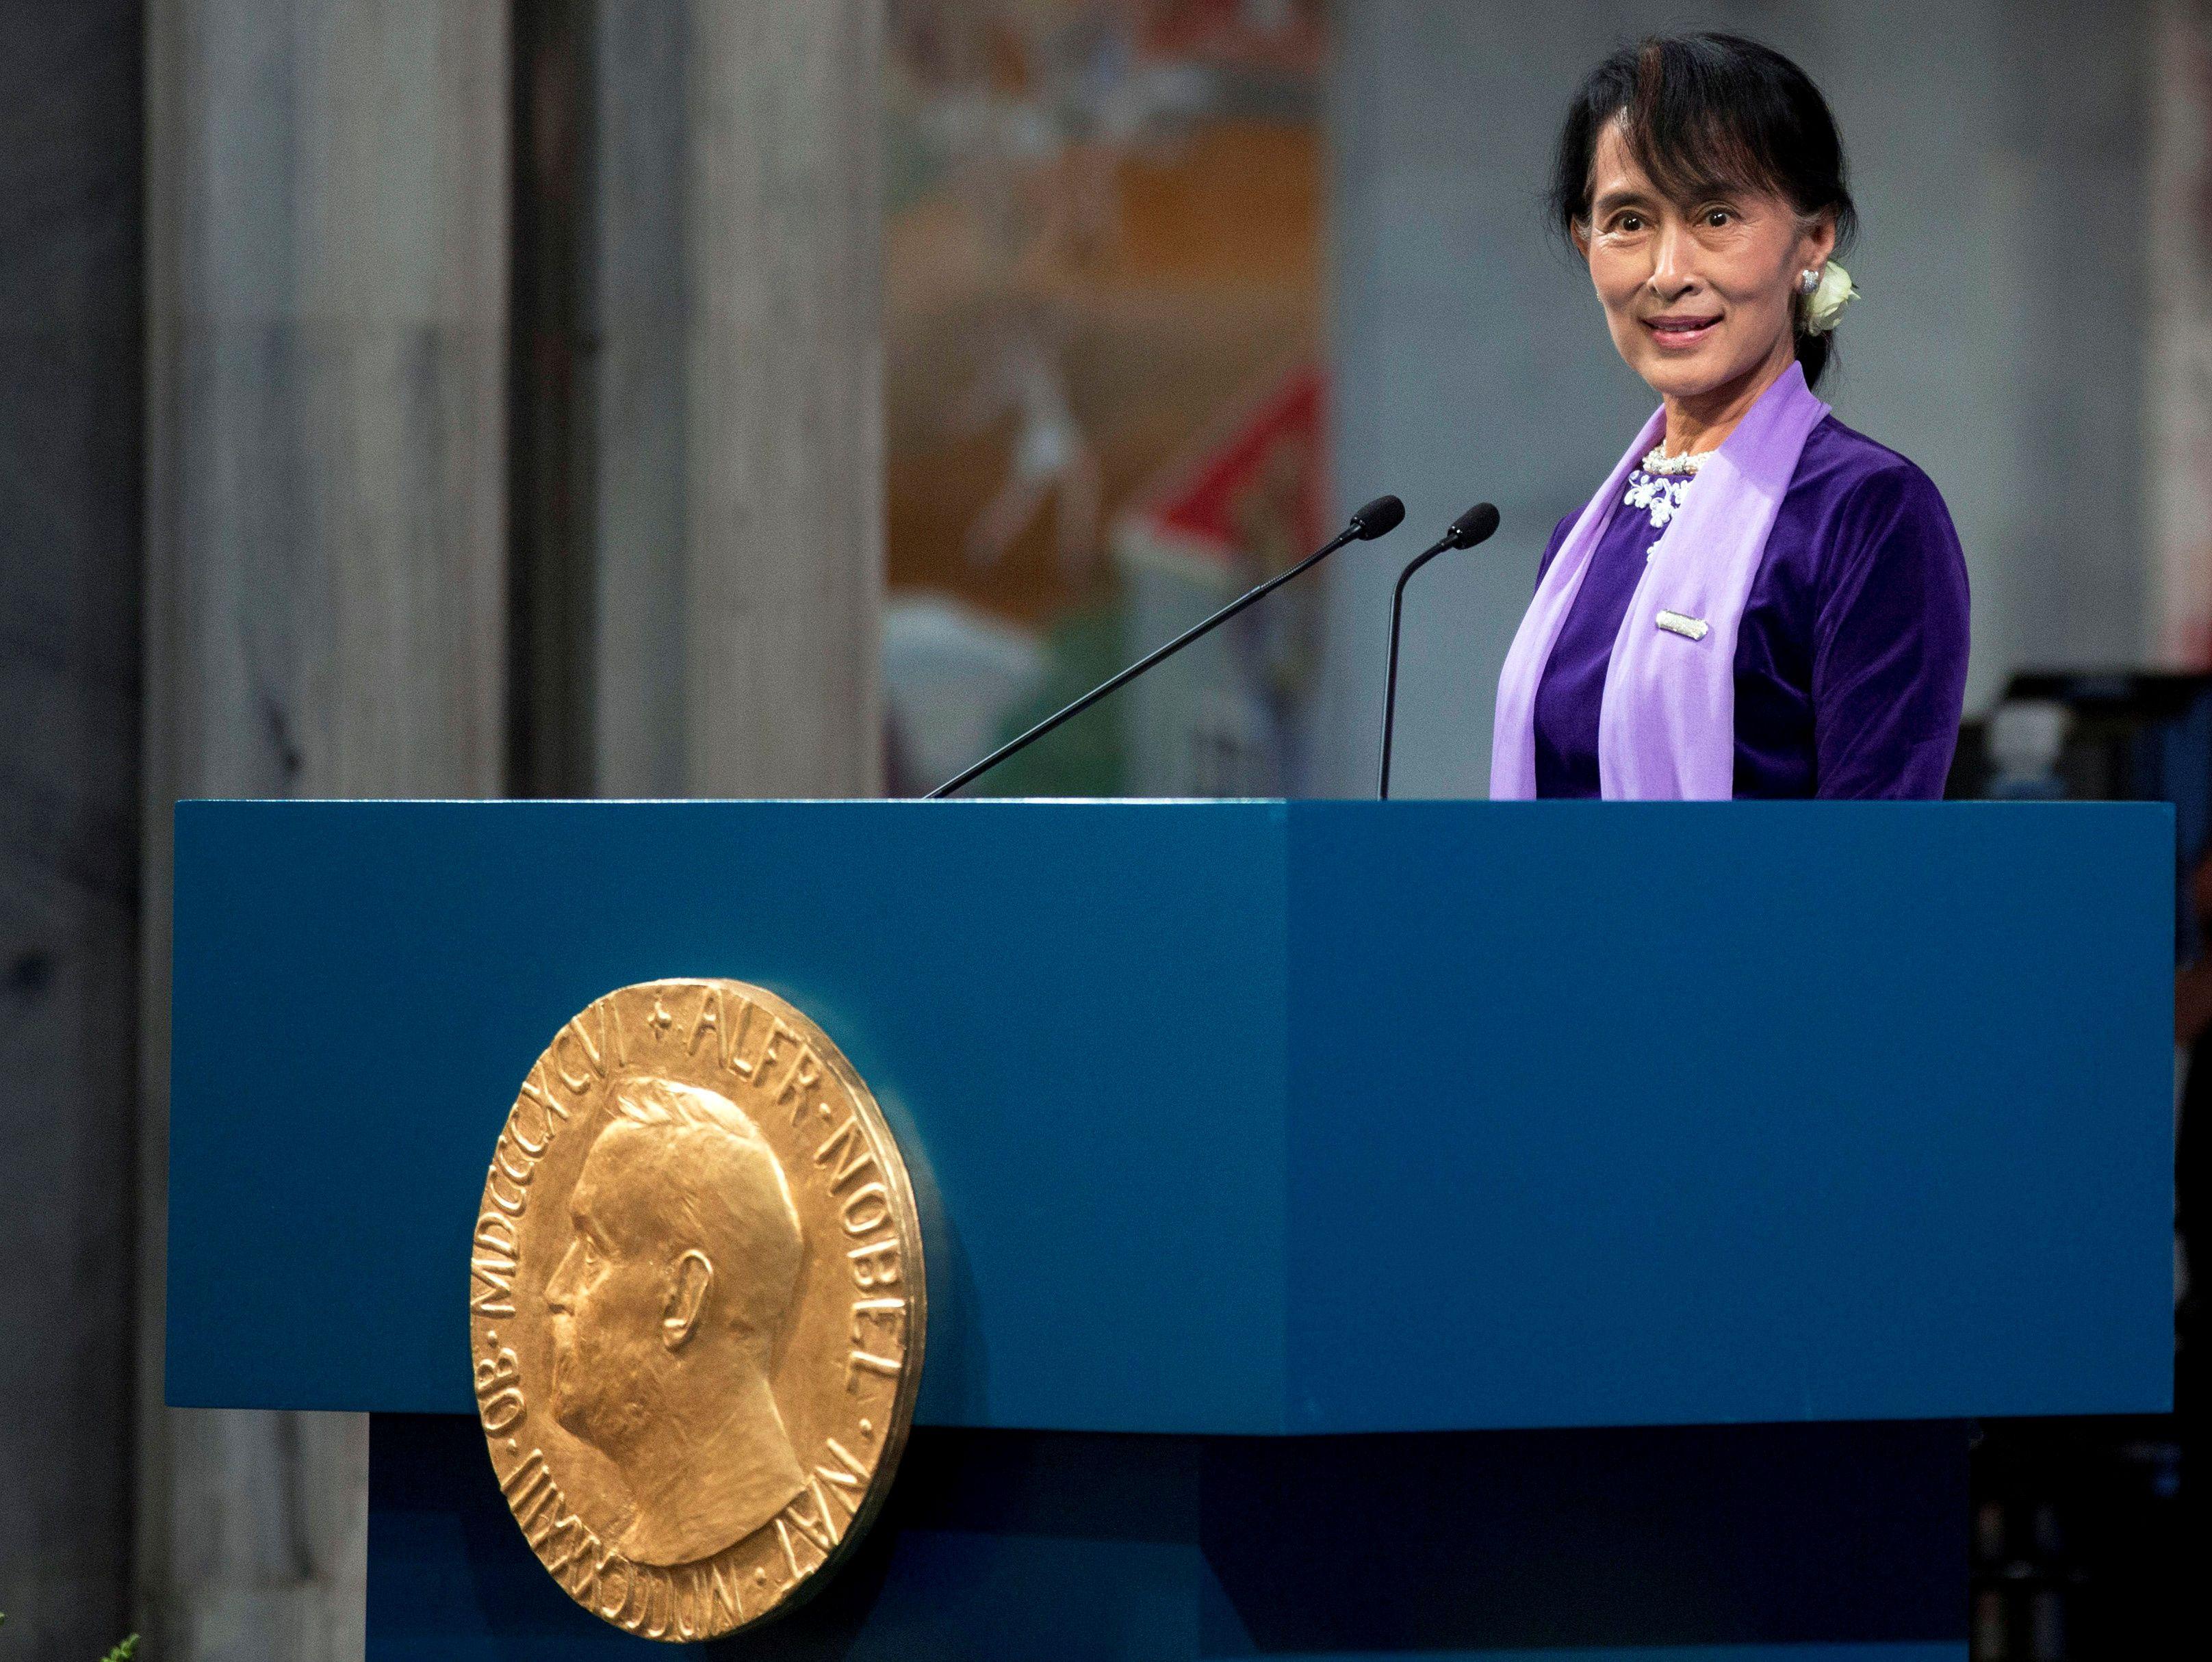 Myanmar leader Suu Kyi departs for genocide hearings amid fanfare at home